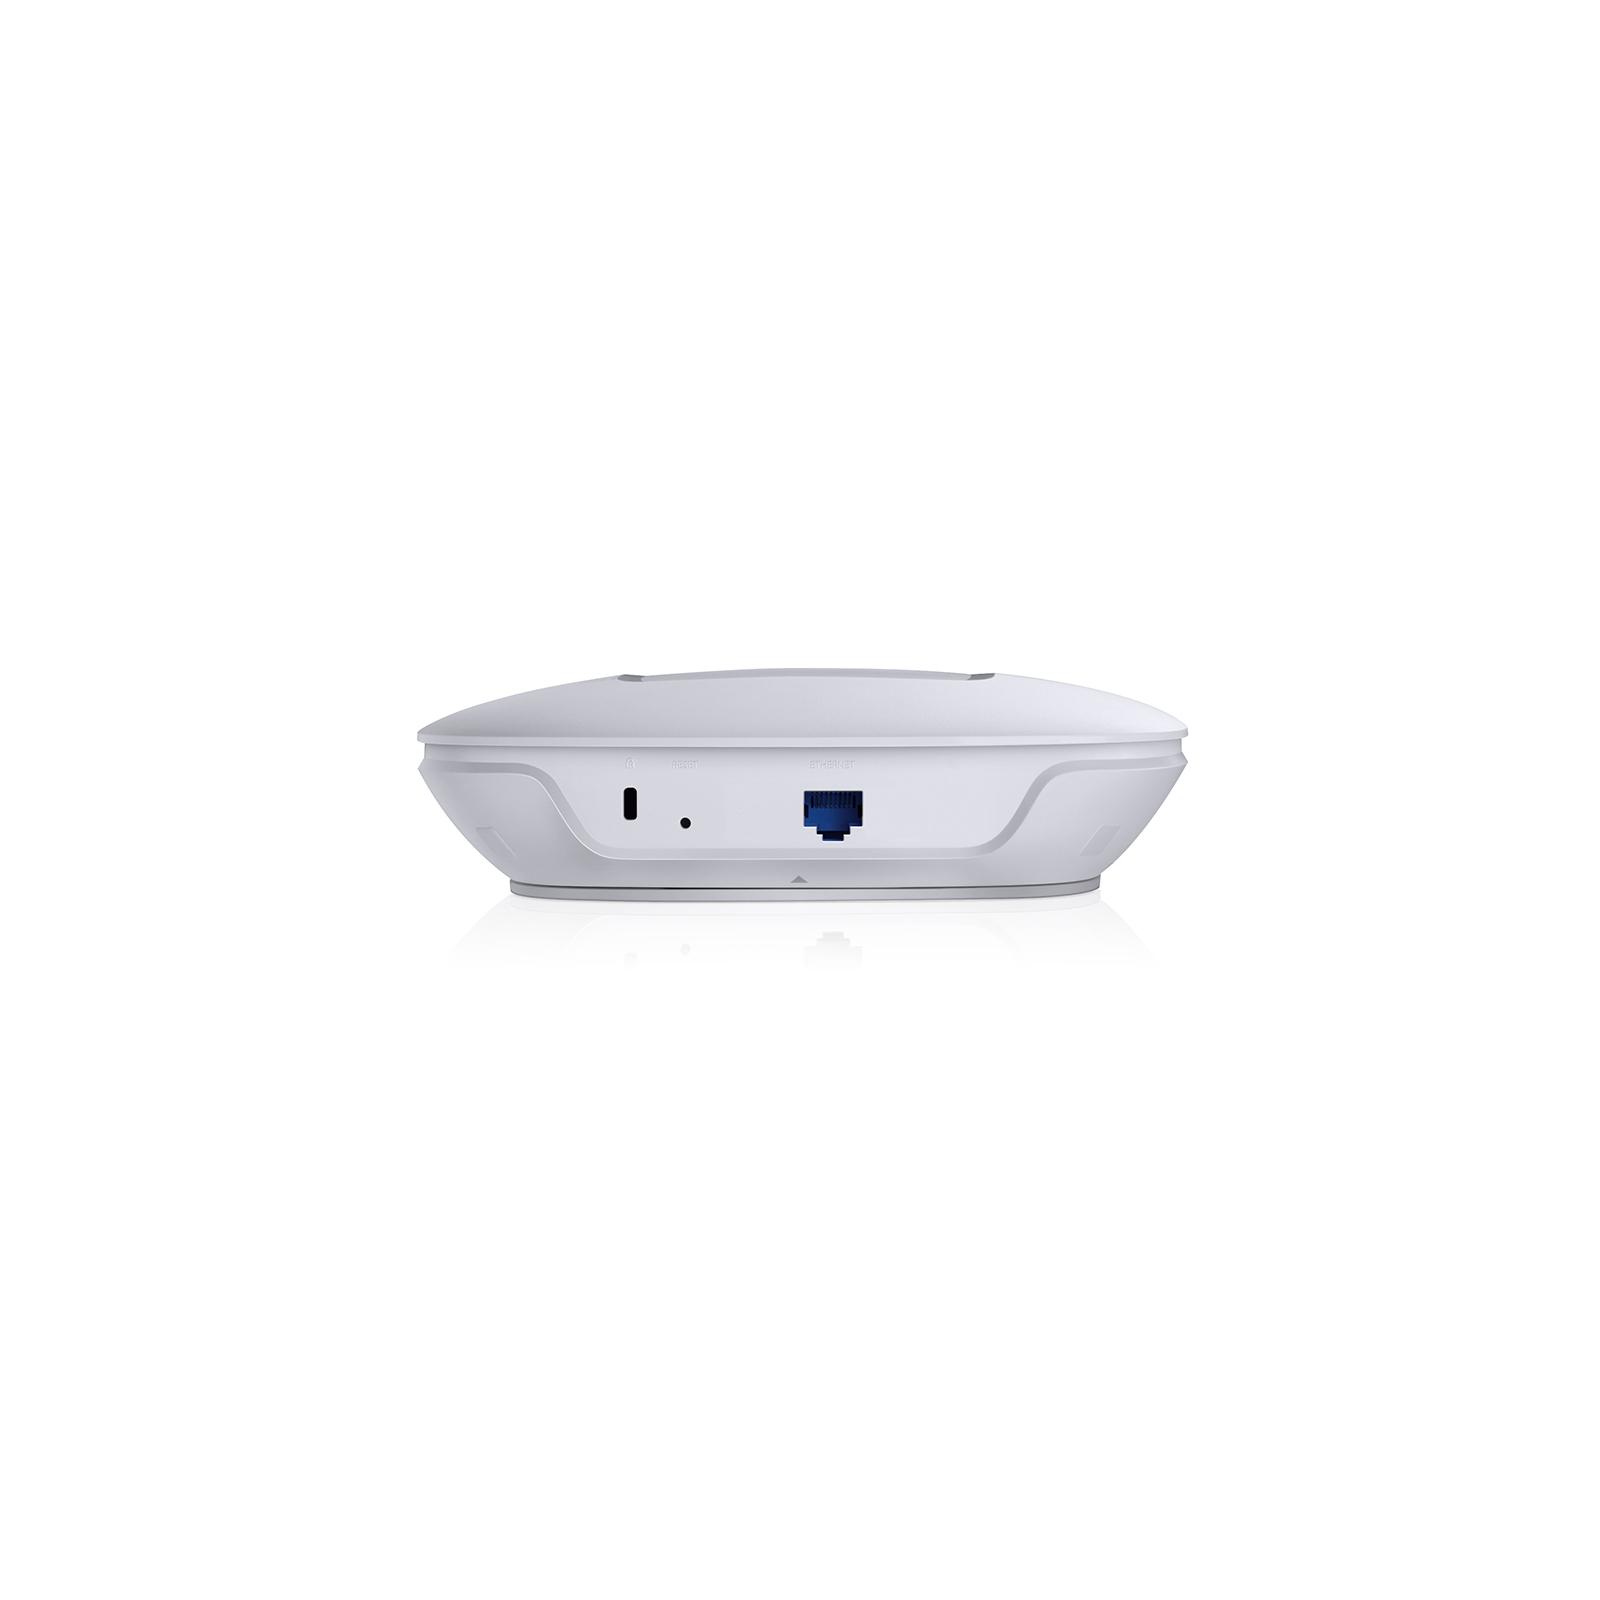 Точка доступа Wi-Fi TP-Link EAP110 изображение 2